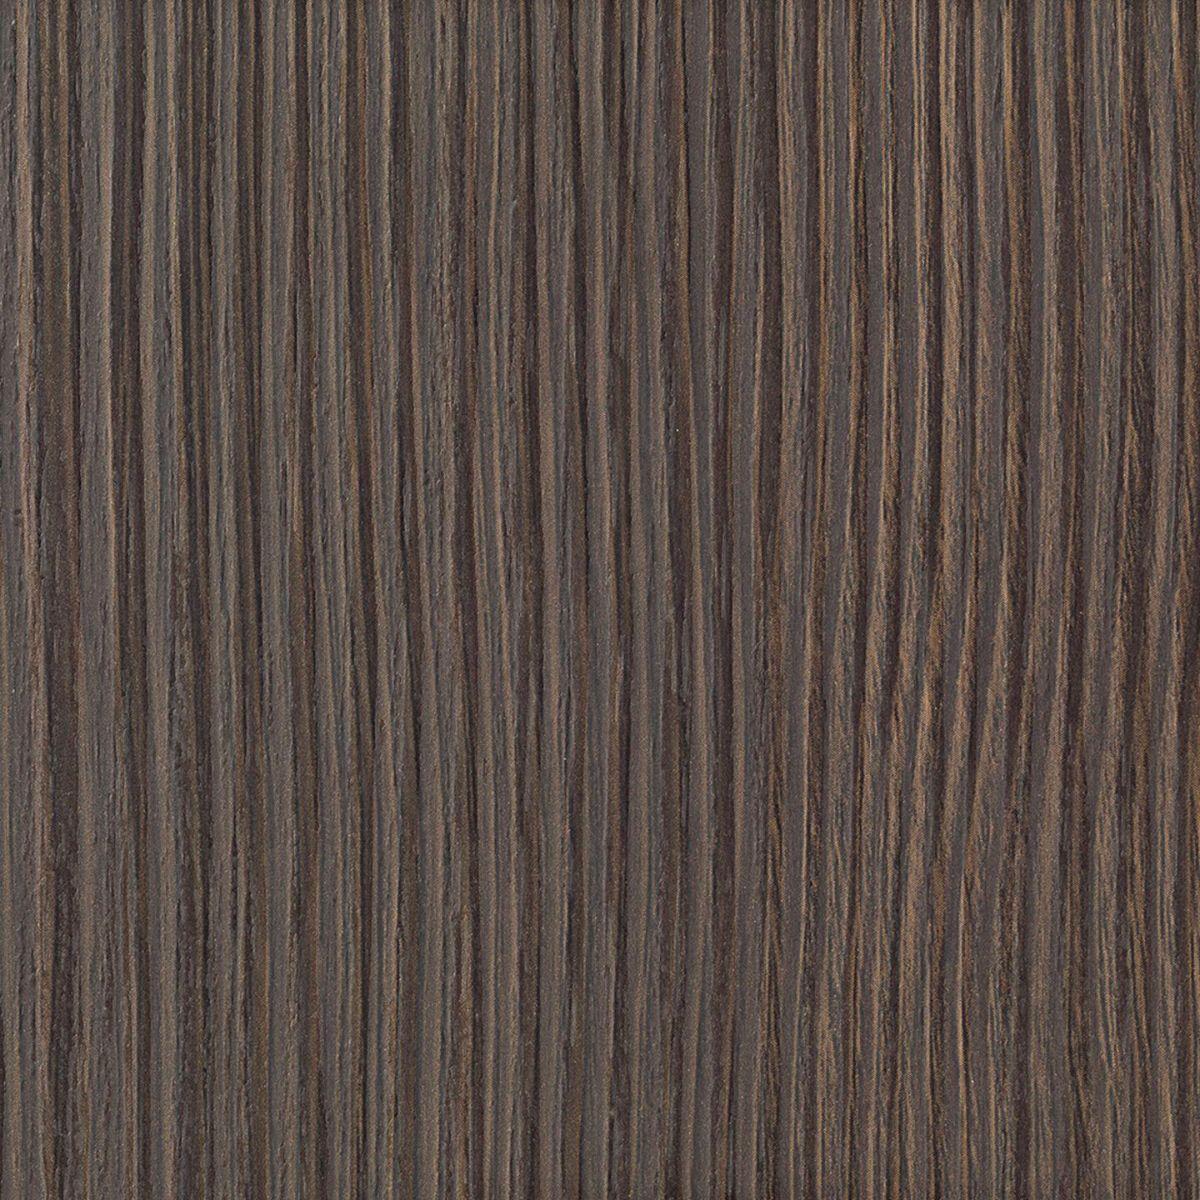 Finishing panels in oregon pine matrix for glass wall